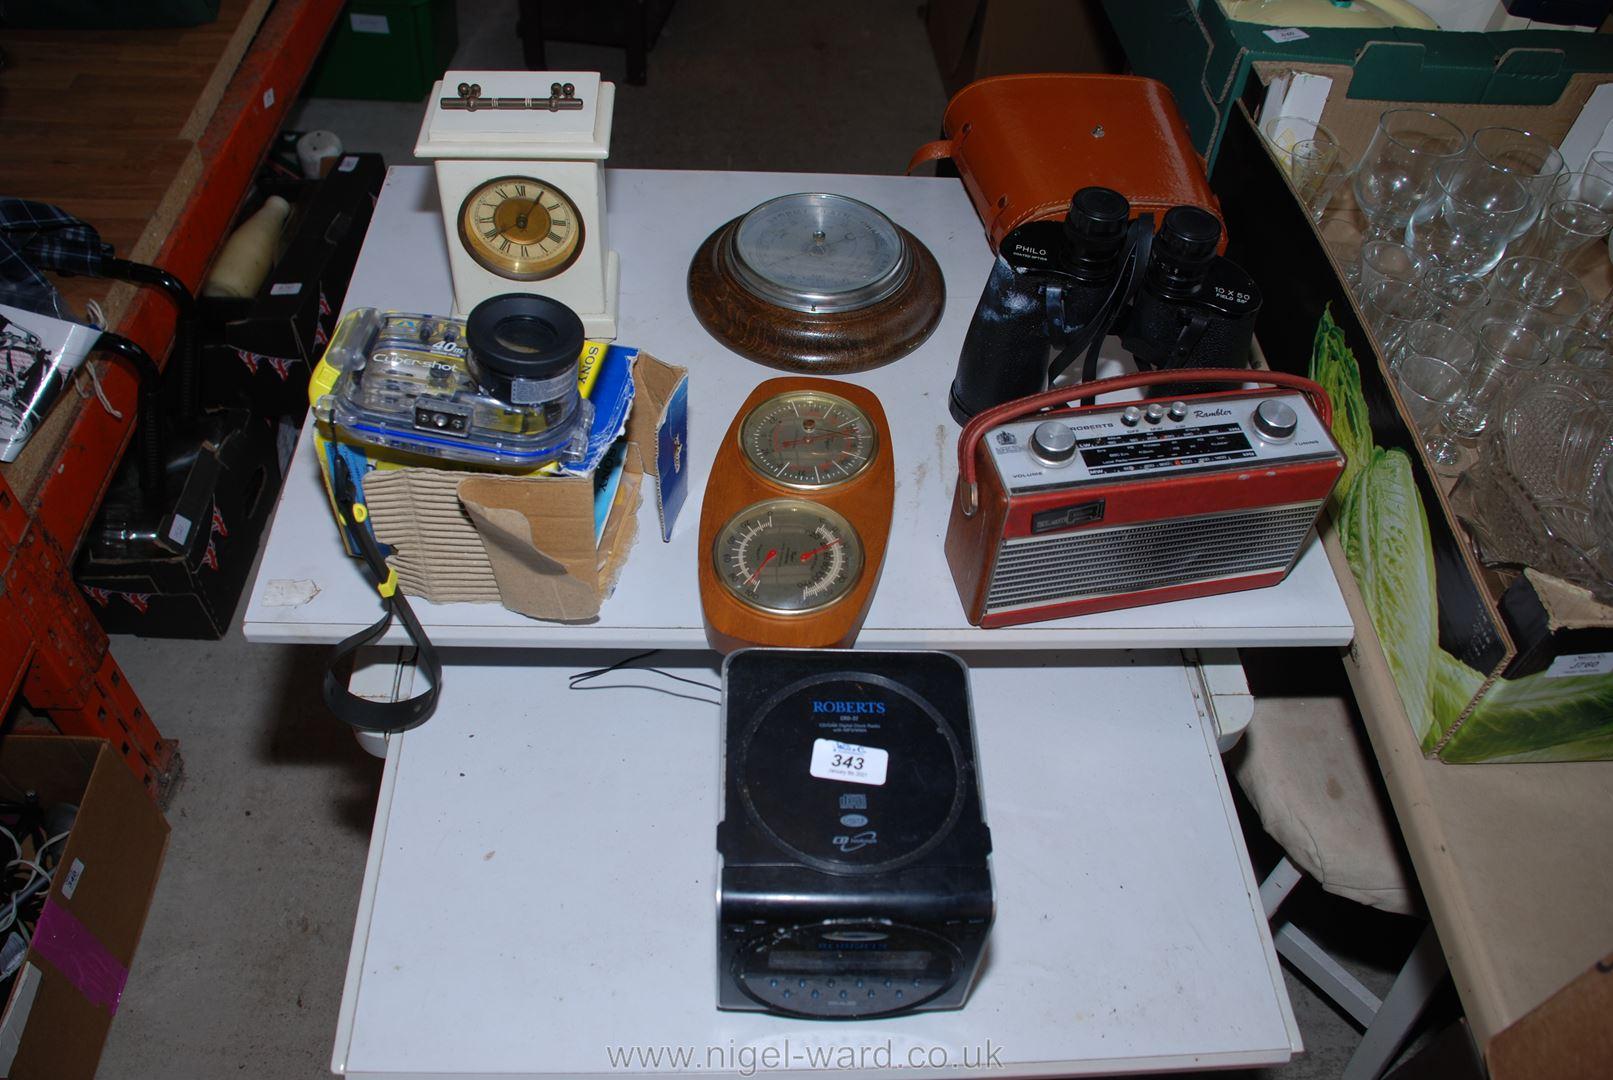 "A pair of 10 x 80 binoculars, clocks, two ""Roberts"" radios, underwater camera housing, etc."